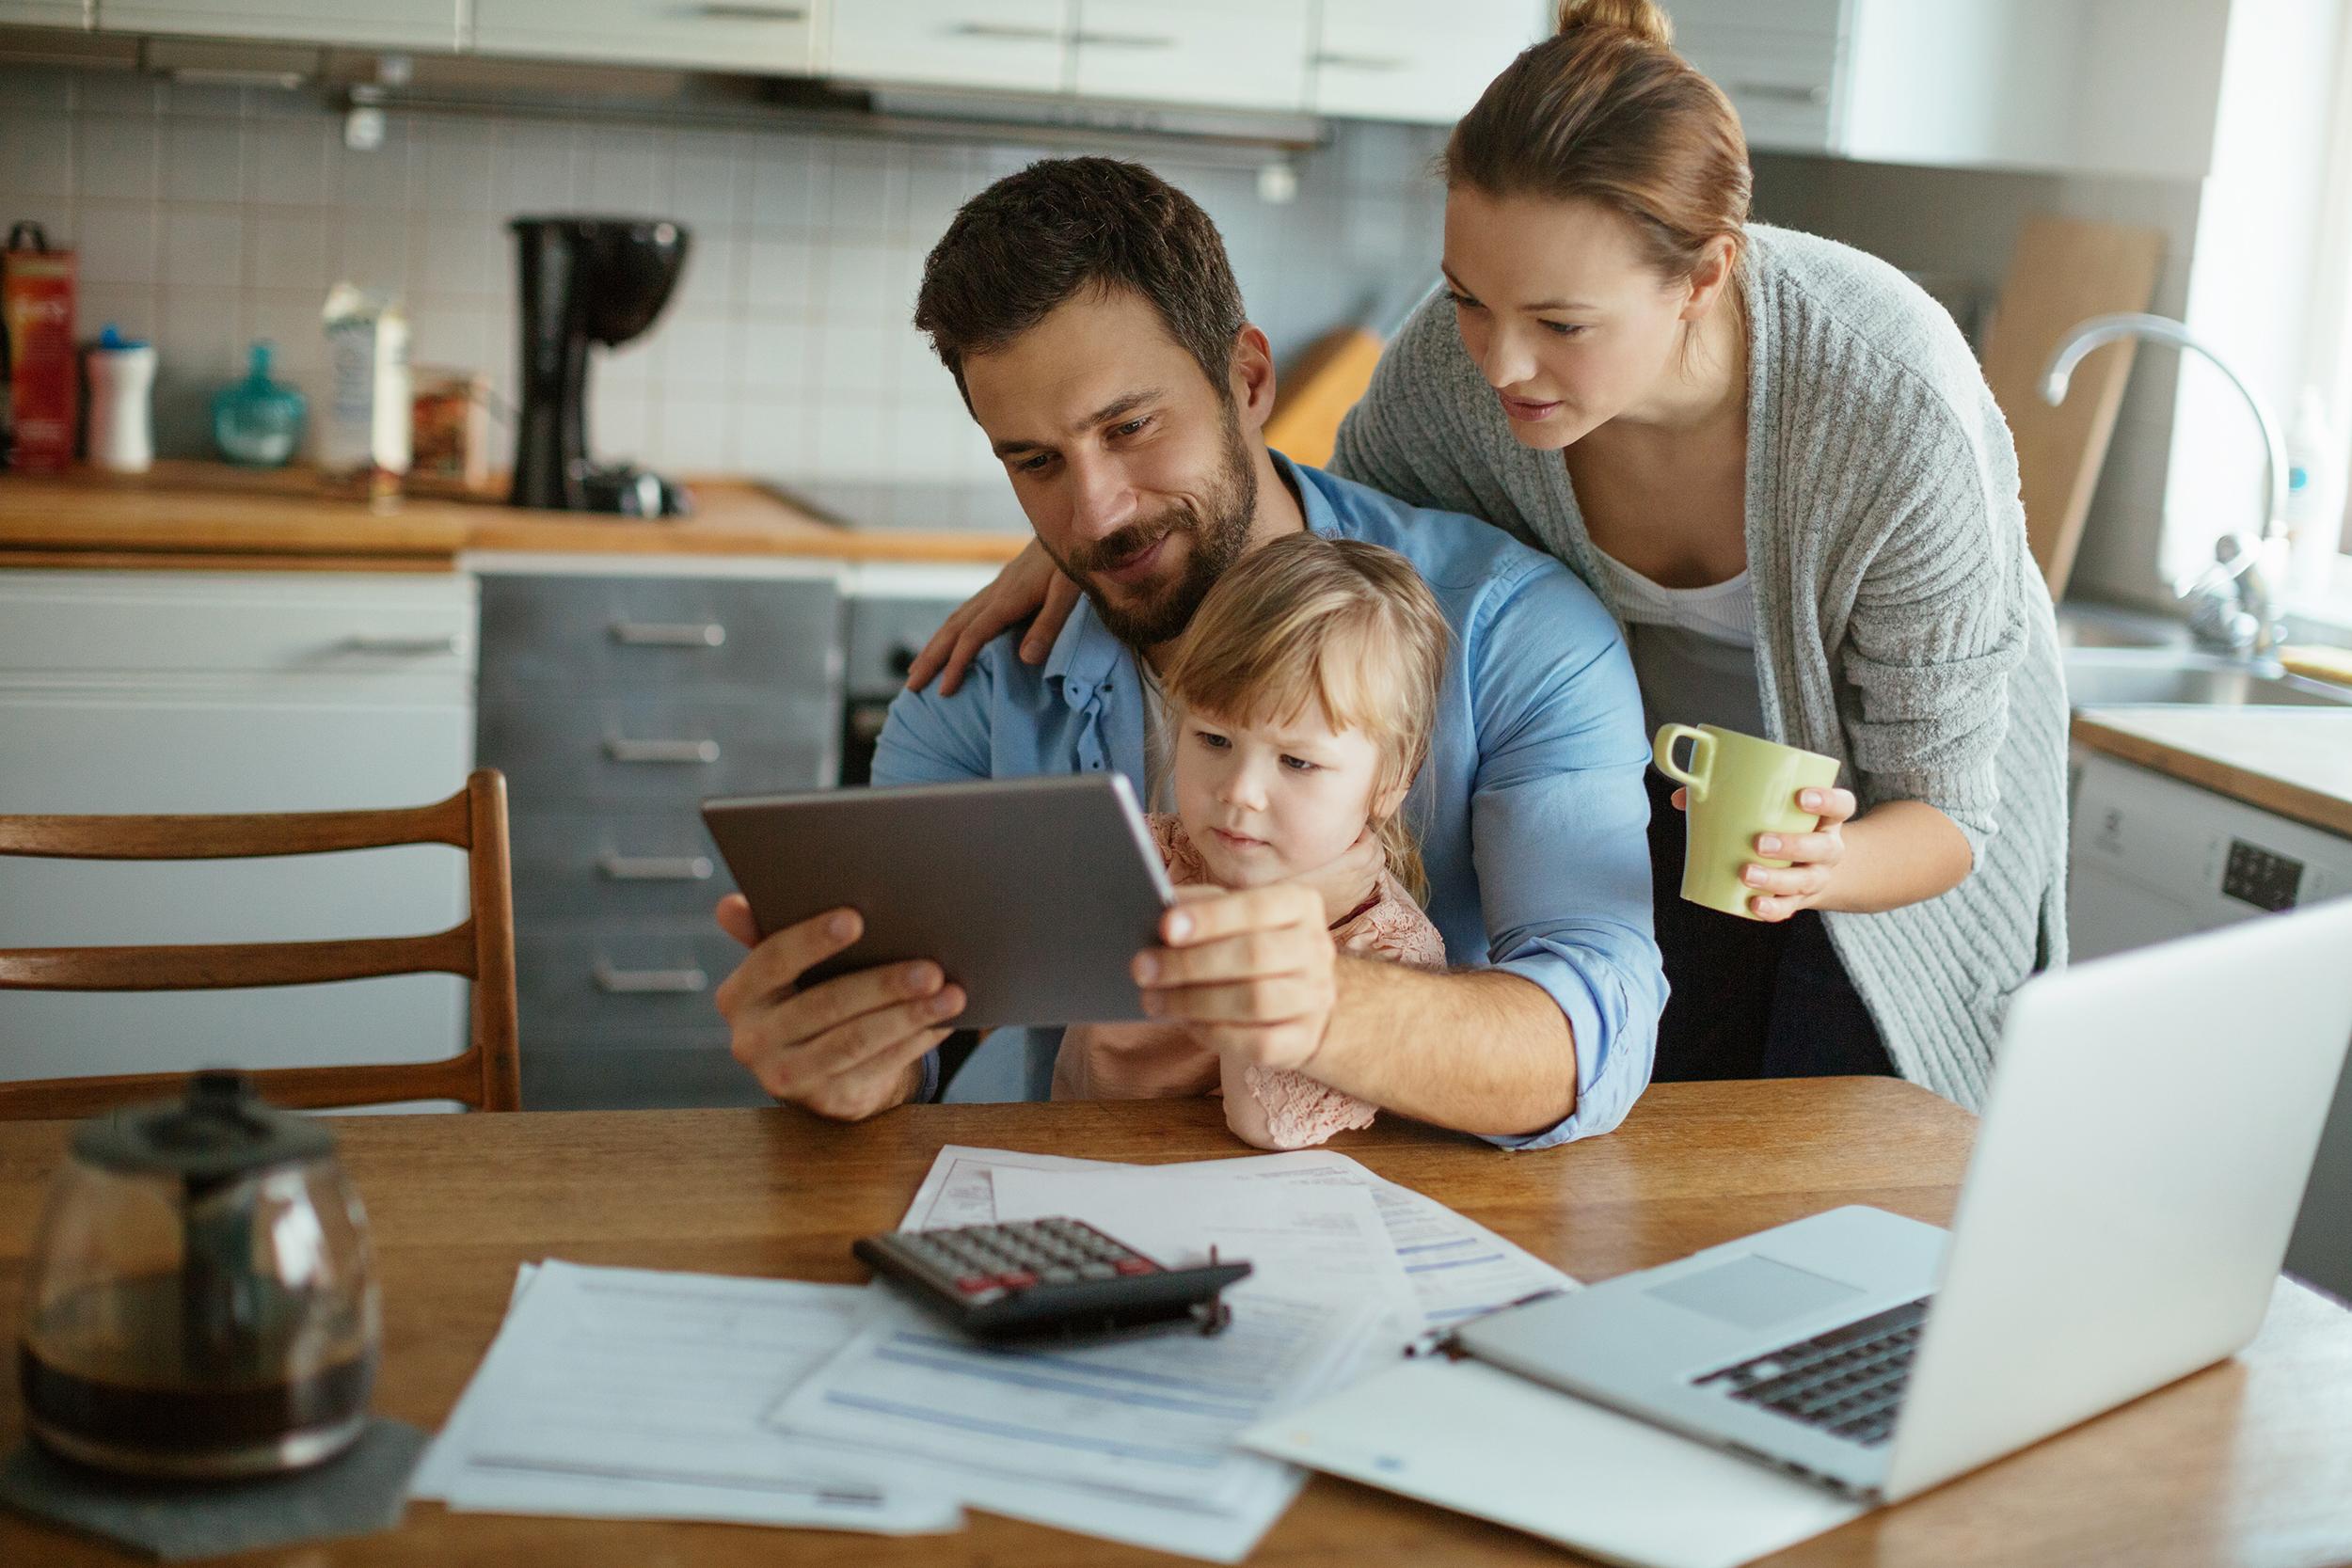 Family kitchen finaces tech 72dpi rgb med